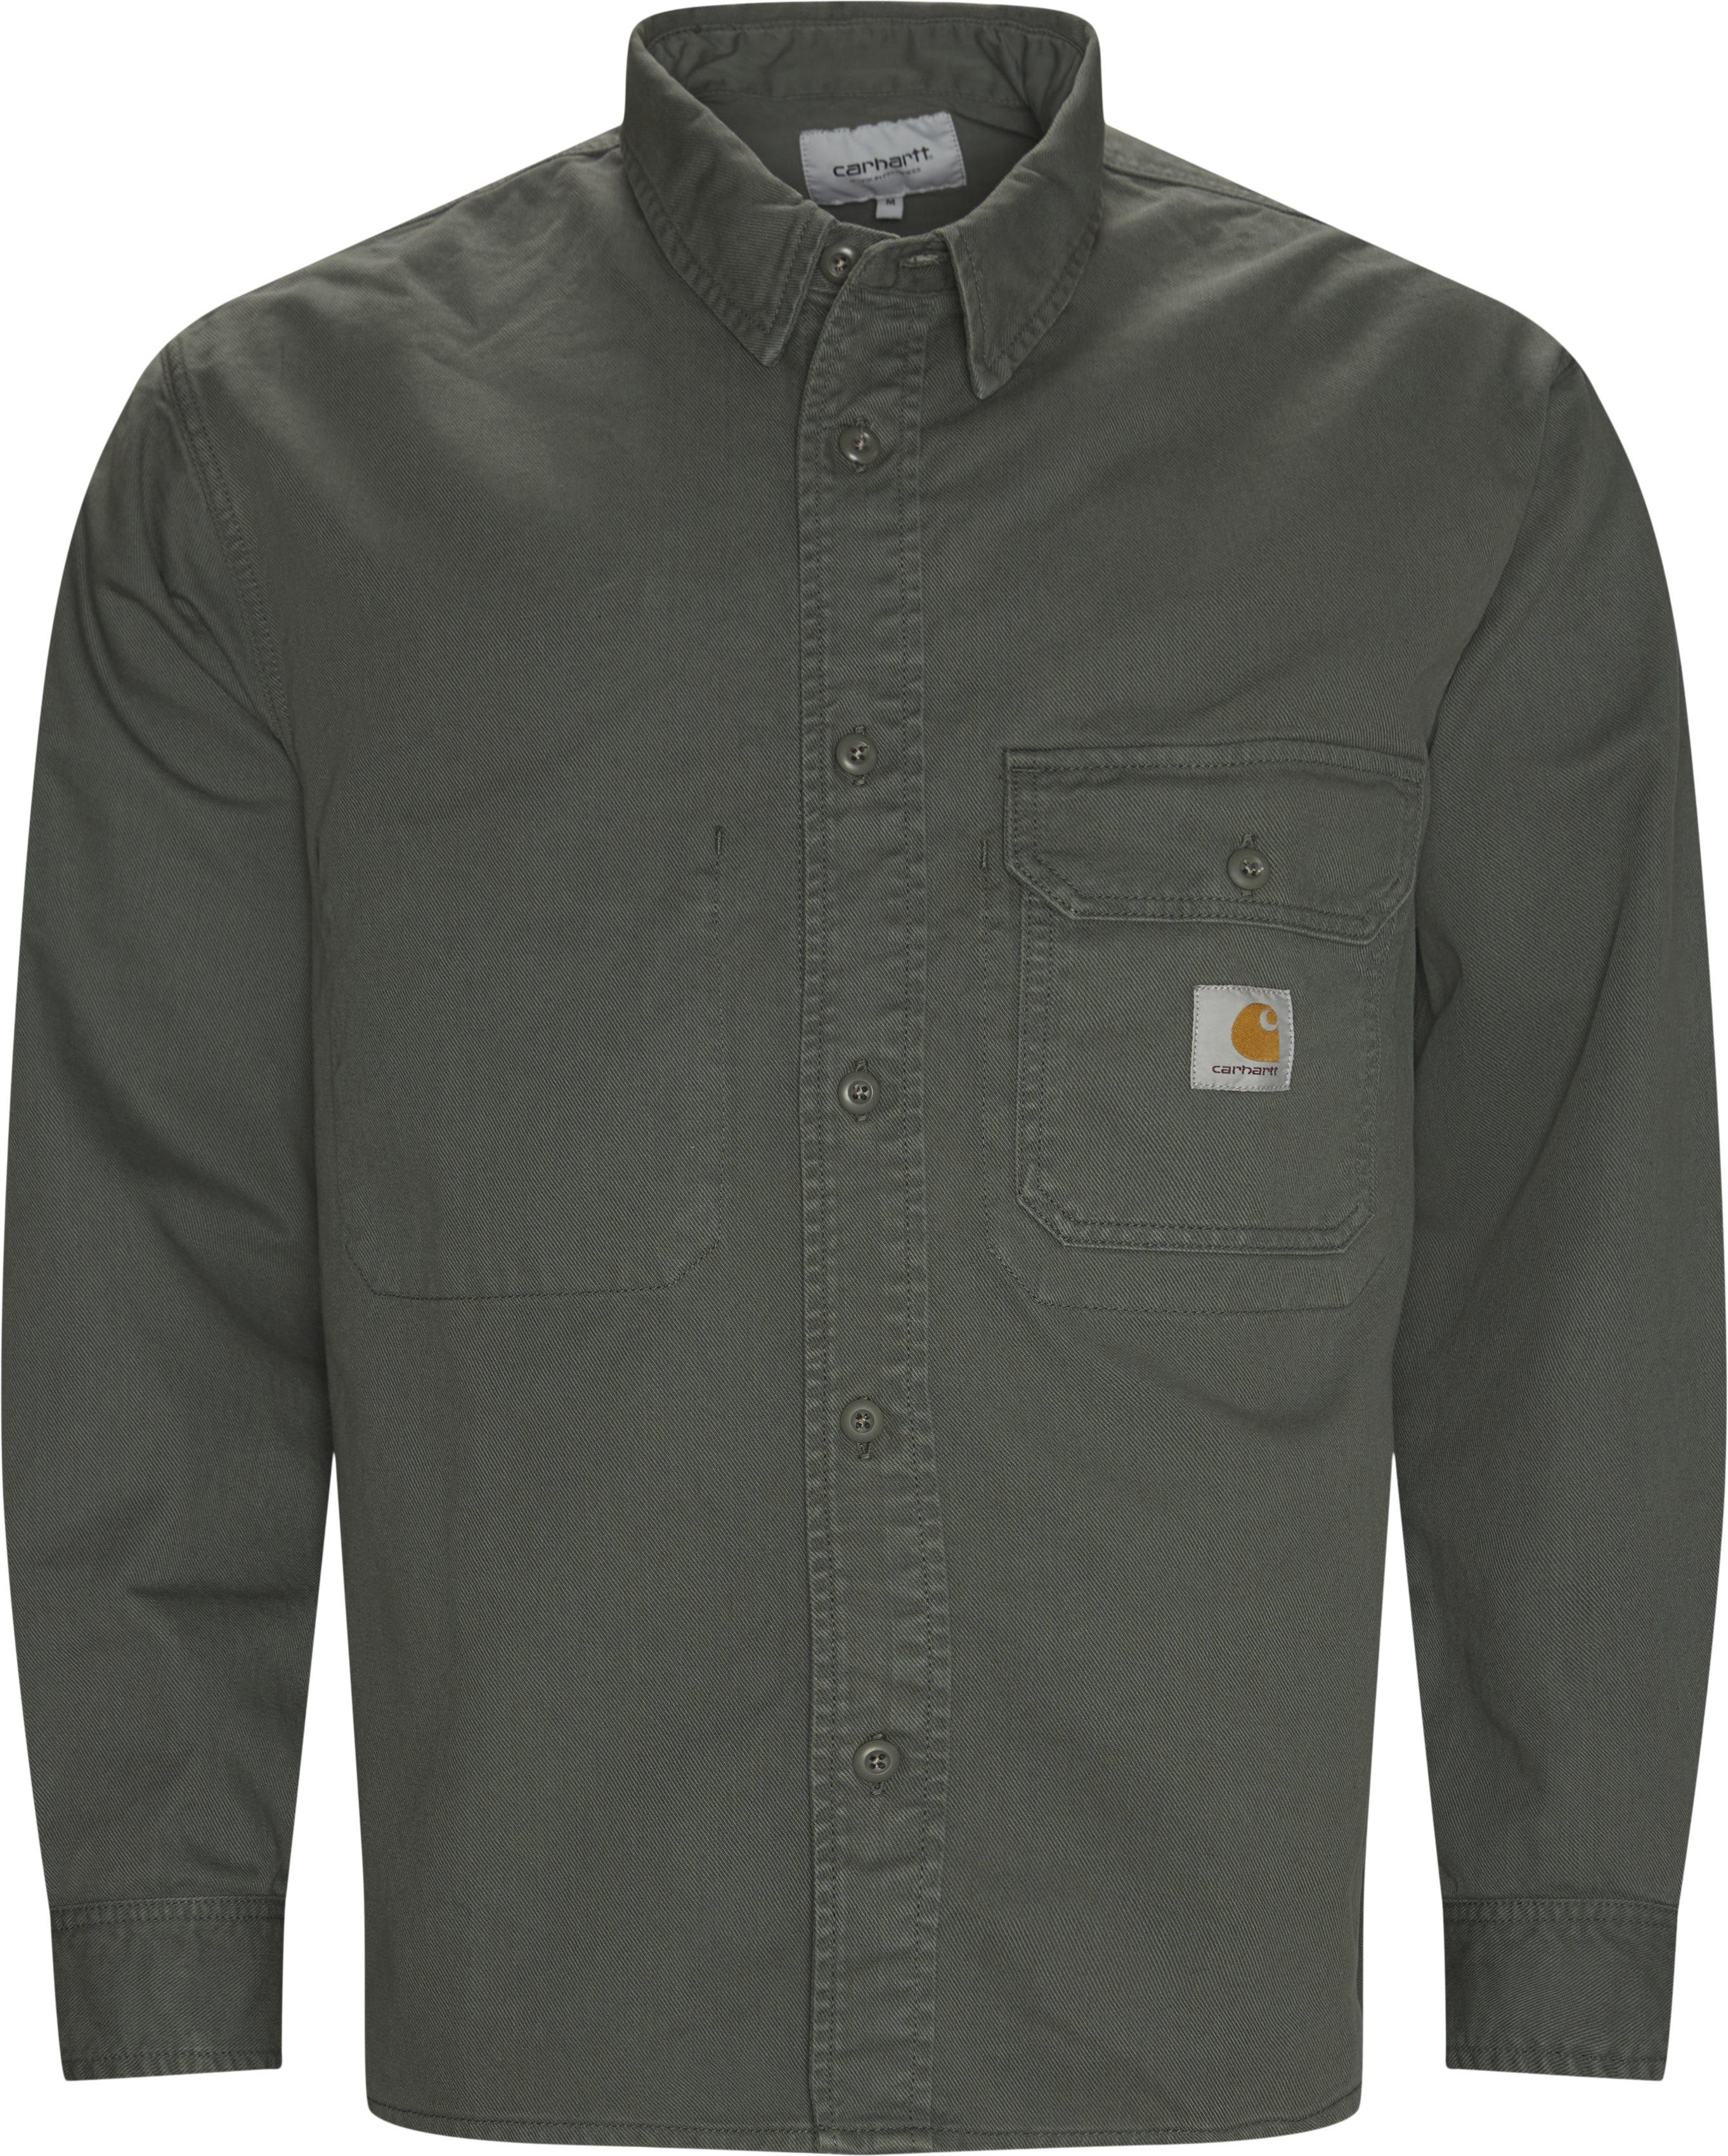 Reno Skjorte - Skjortor - Regular fit - Grön